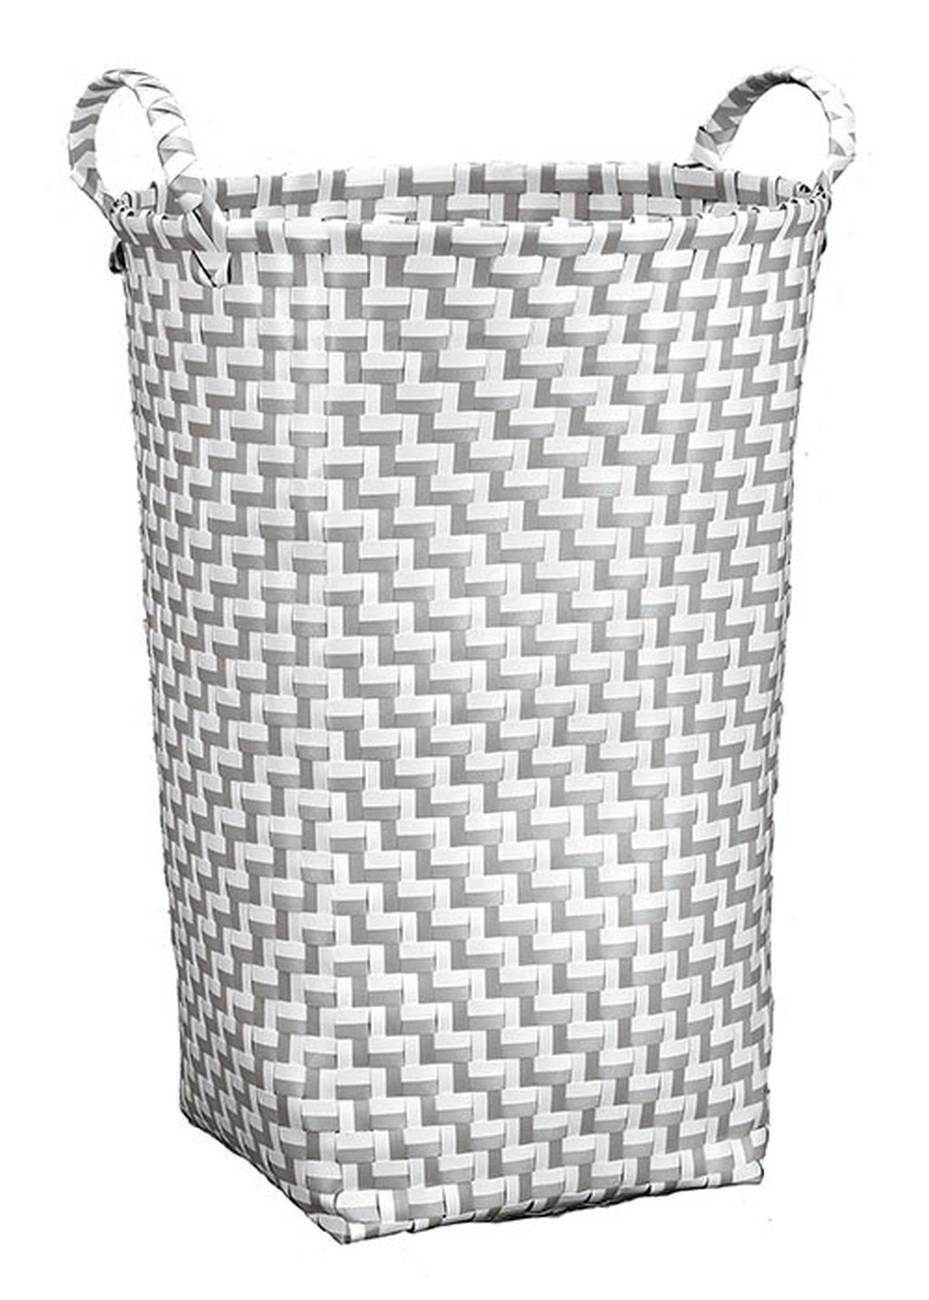 Wäschebox Double Laundry 100 % Polypropylen Platin Wäschebox 35x50 cm